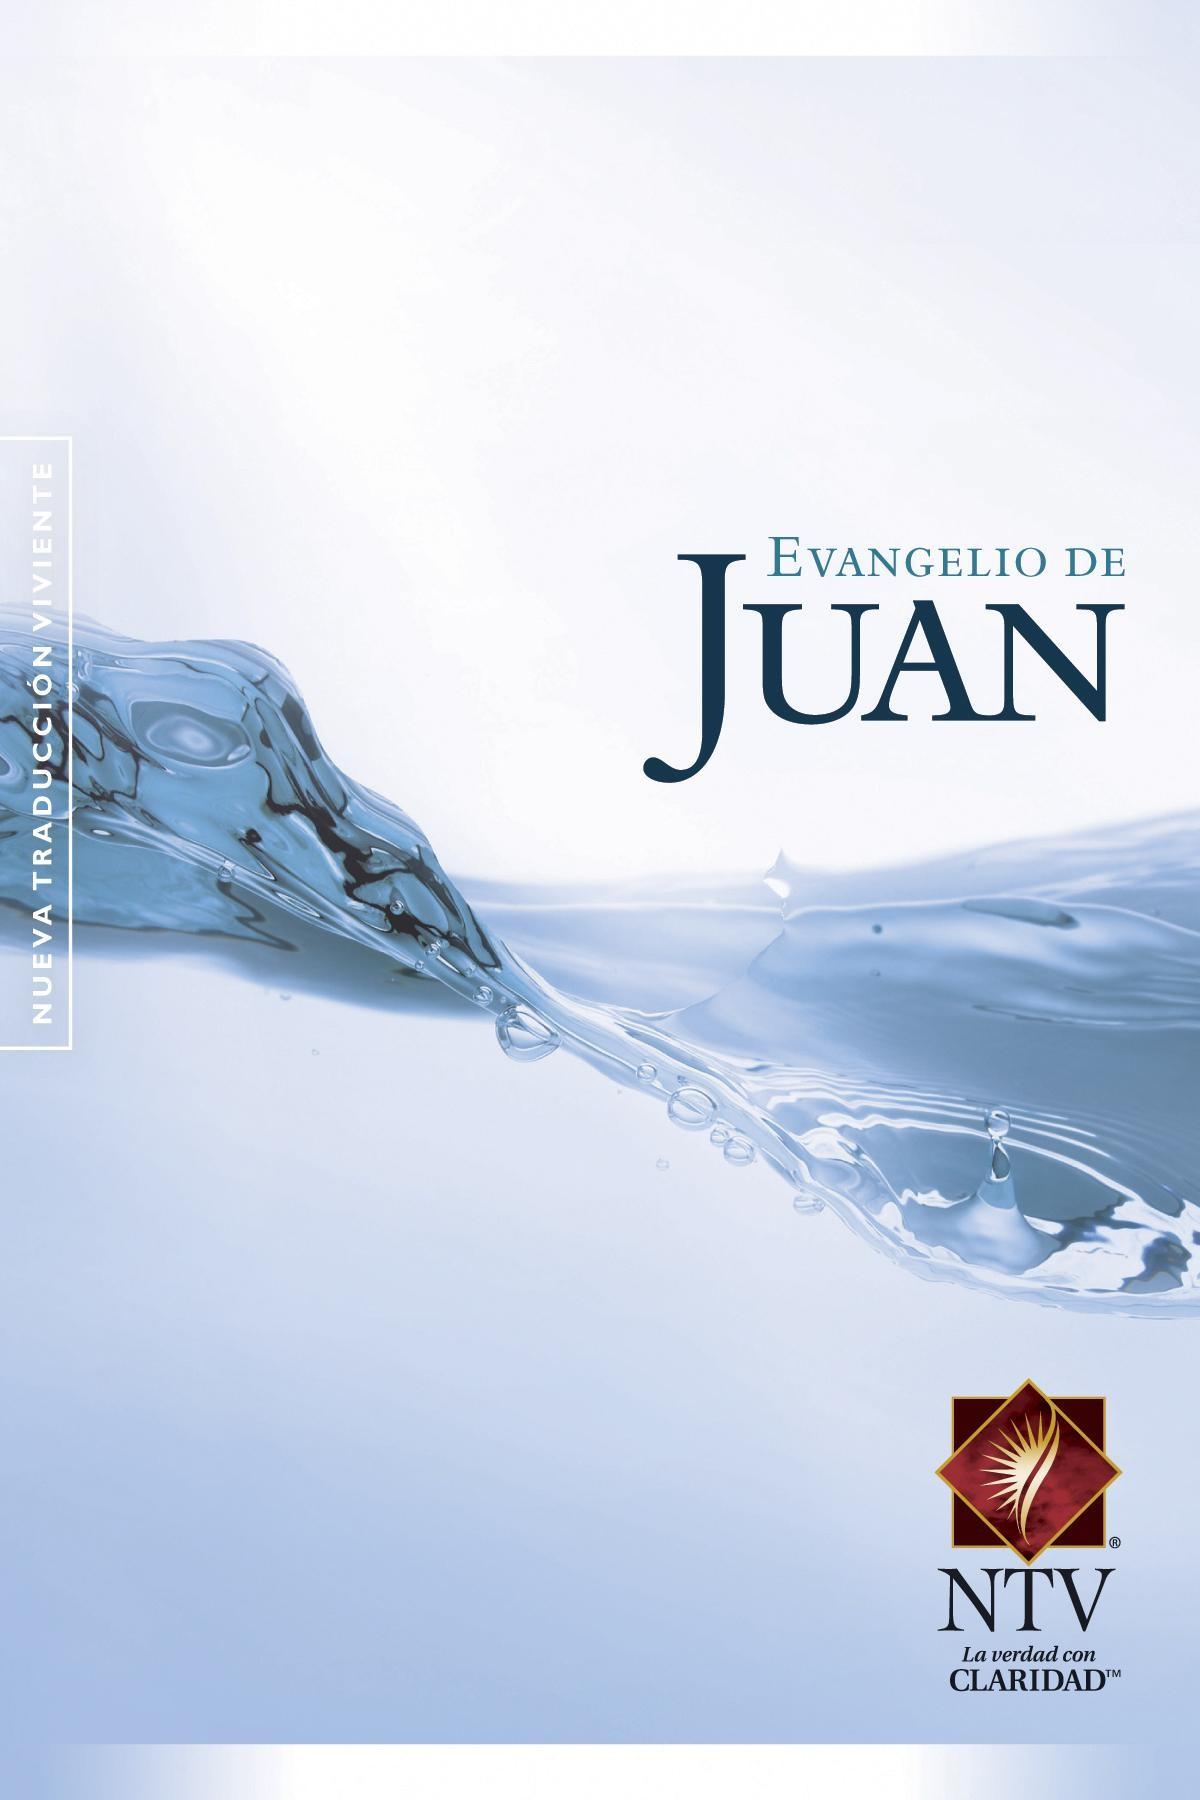 The Evangelio de Juan NTV 10-paquetes (Tapa rústica)